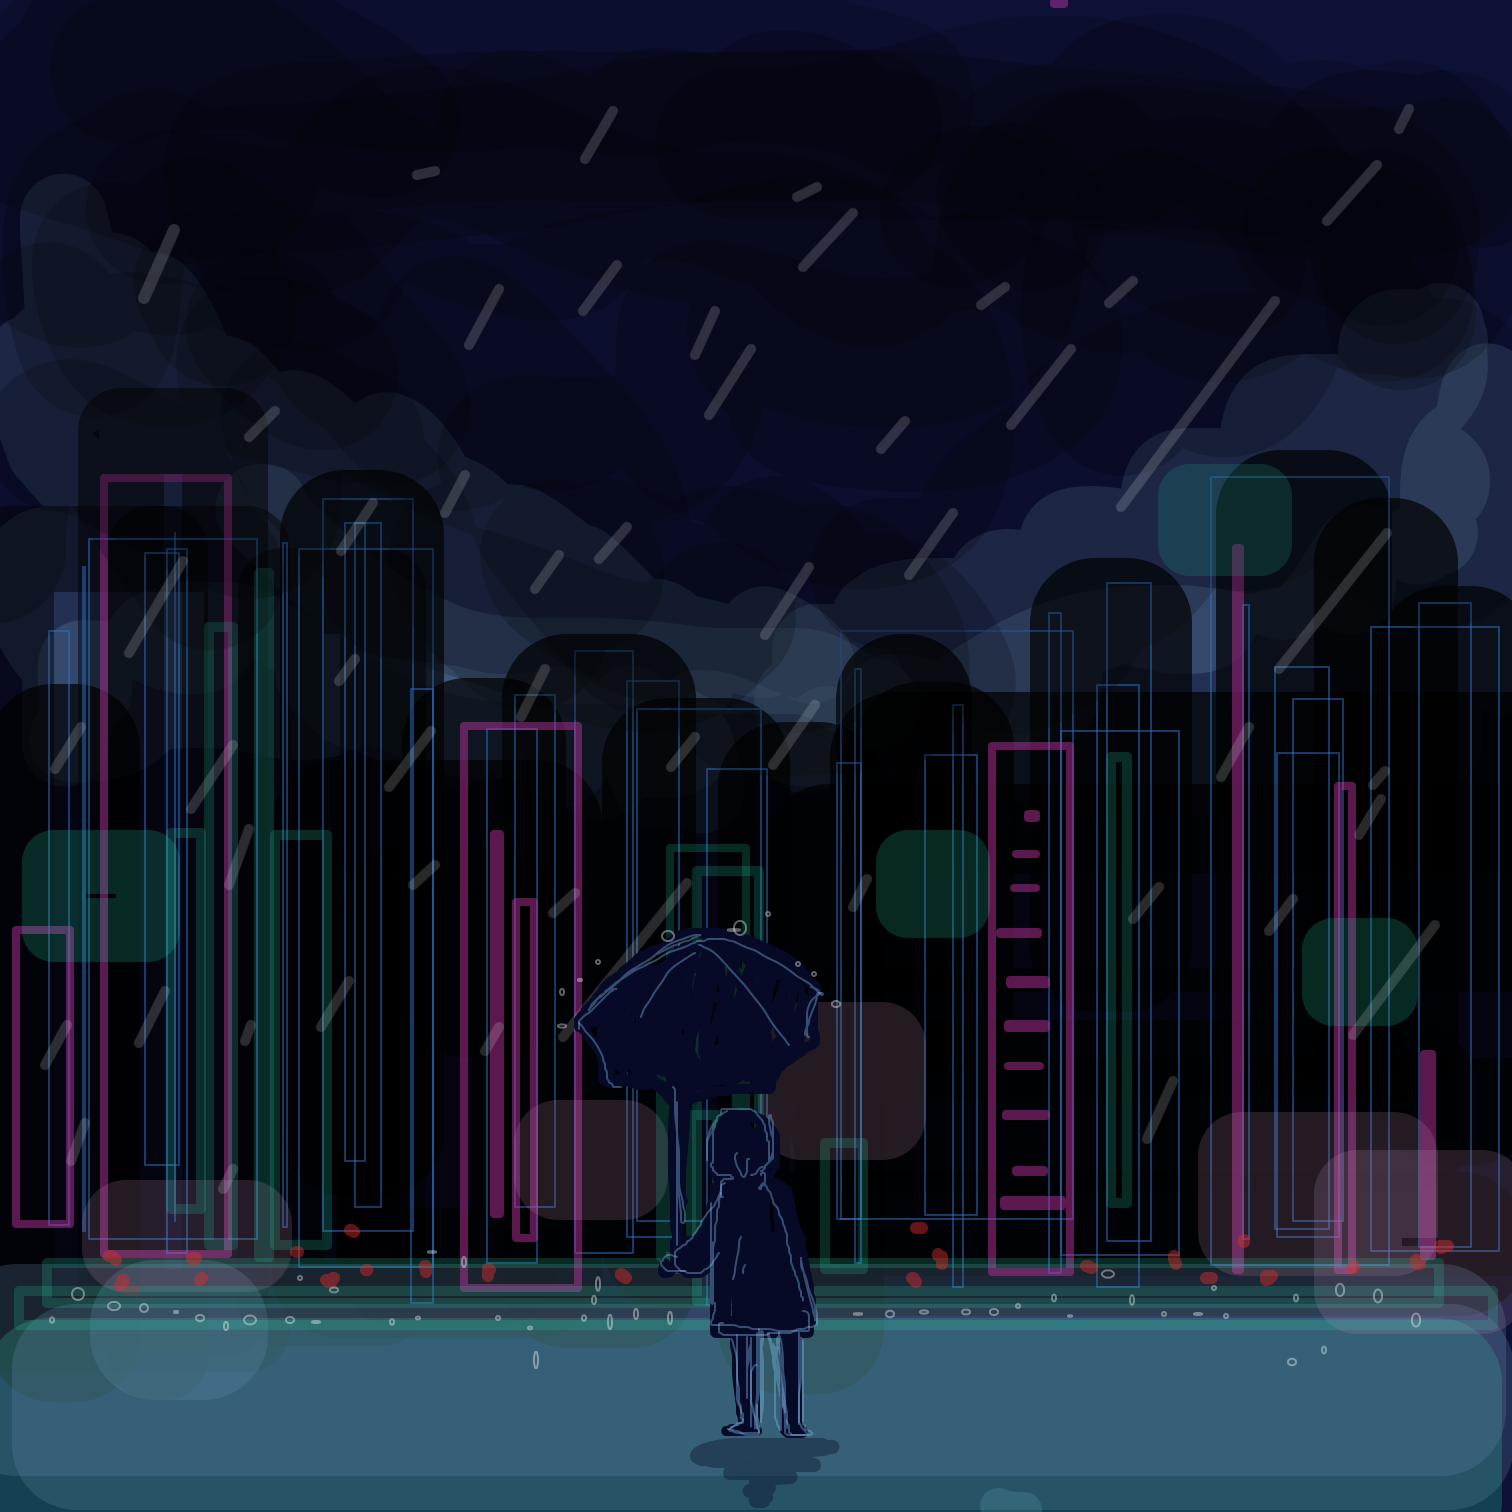 Drawing in Rainy night  by Juleefish